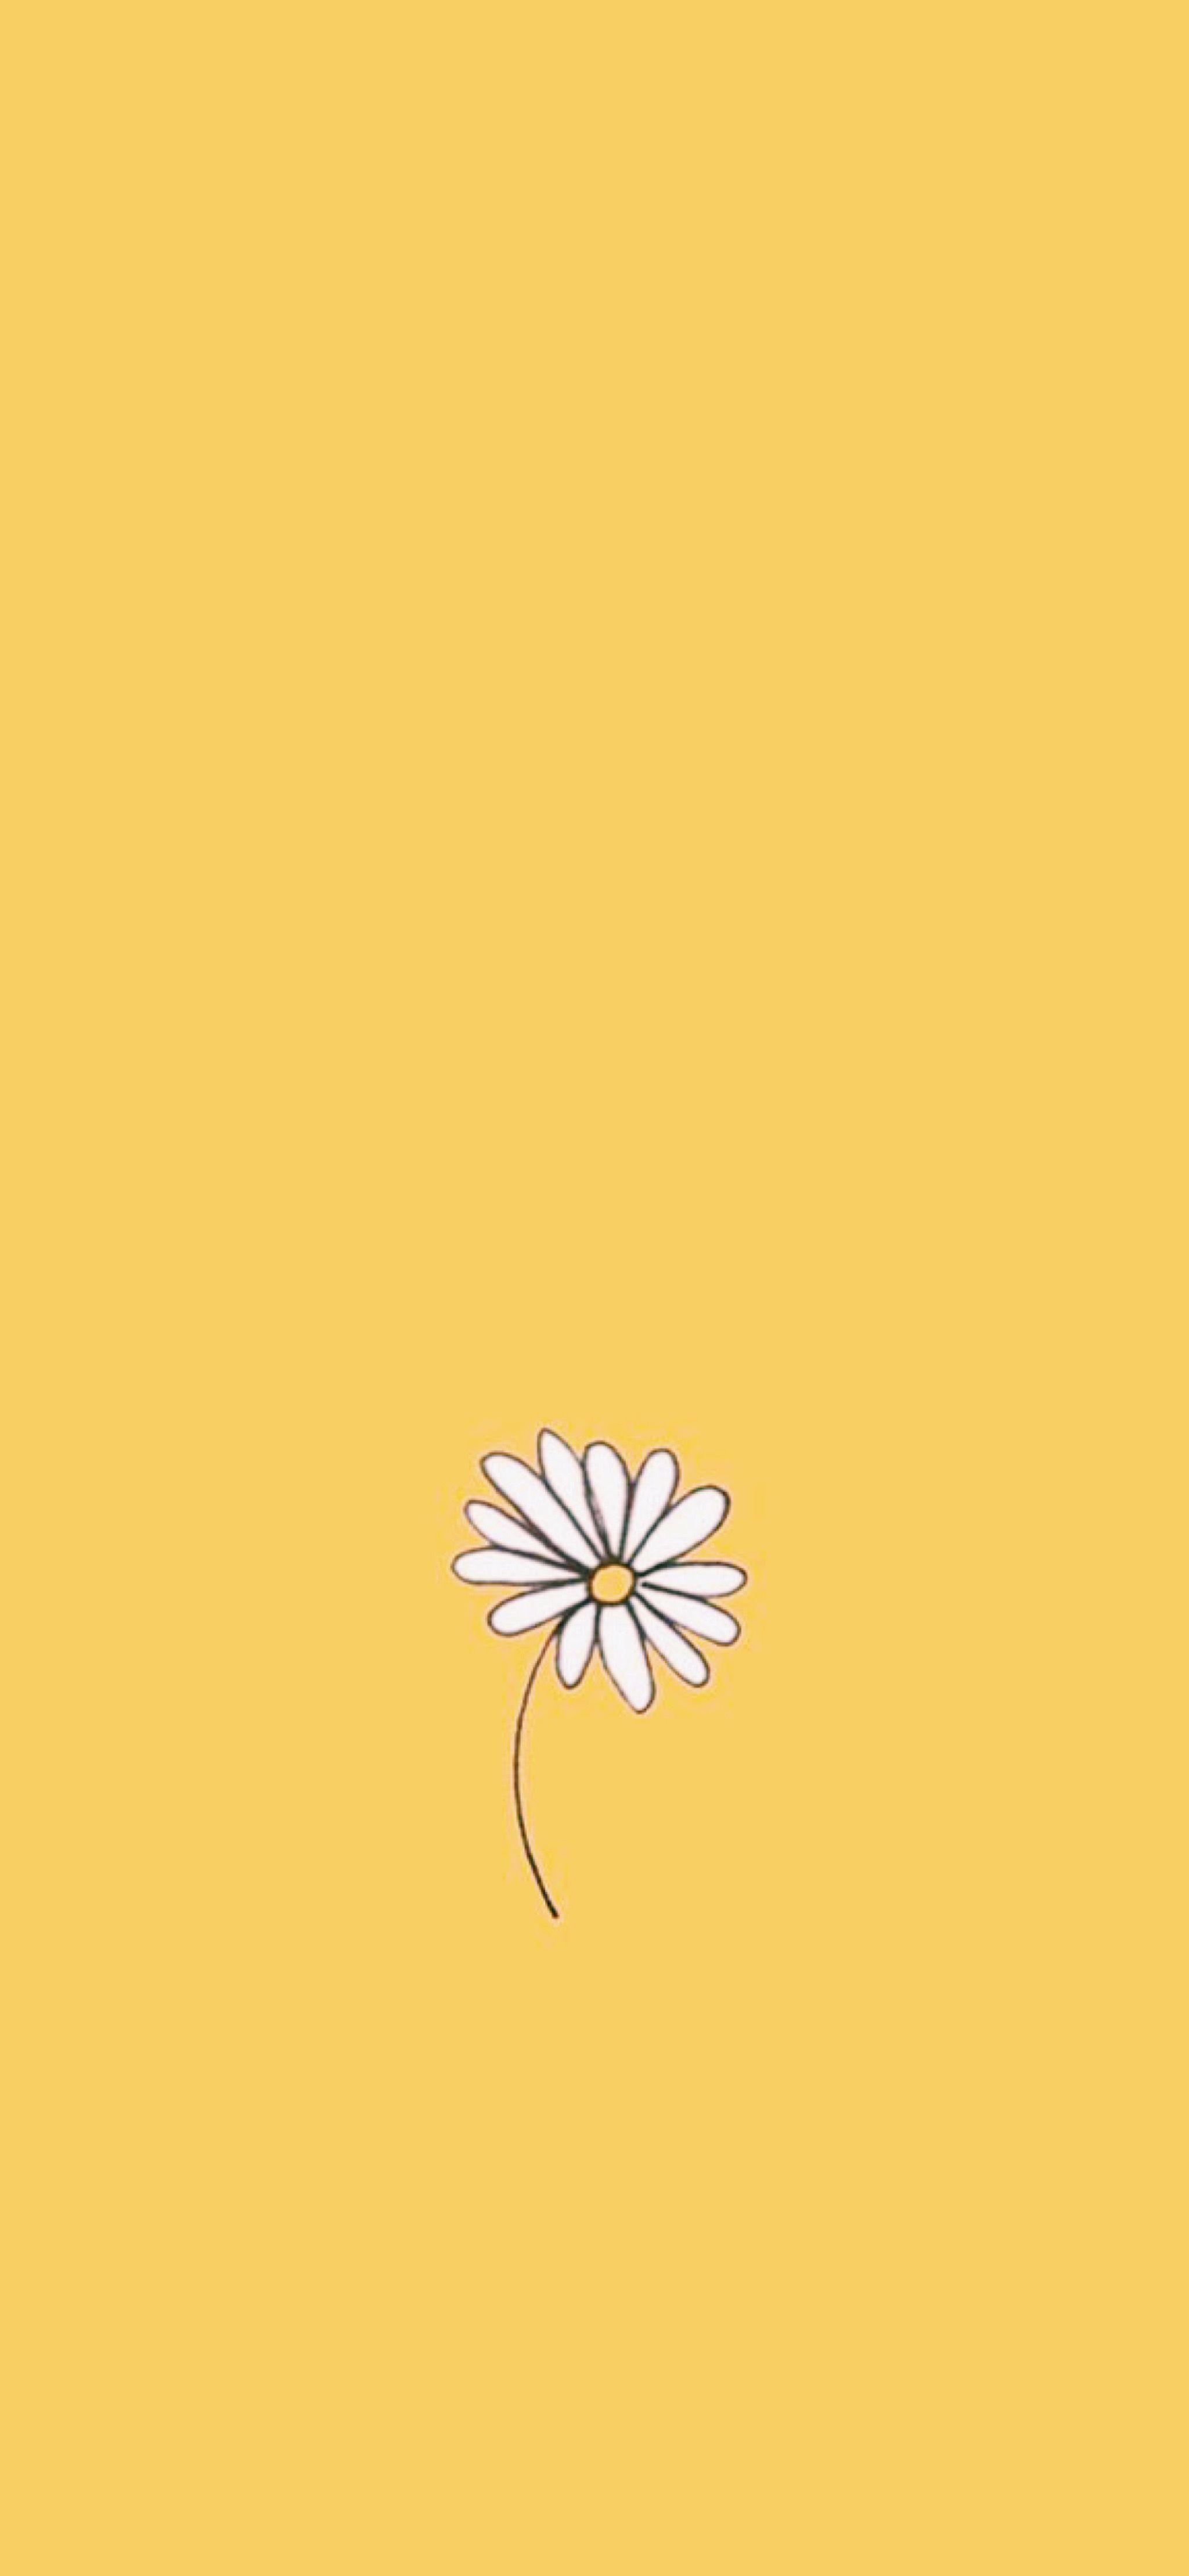 Pastel Yellow Wallpaper Iphone Wallpaper Yellow Yellow Aesthetic Pastel Yellow Wallpaper Cute yellow wallpaper images